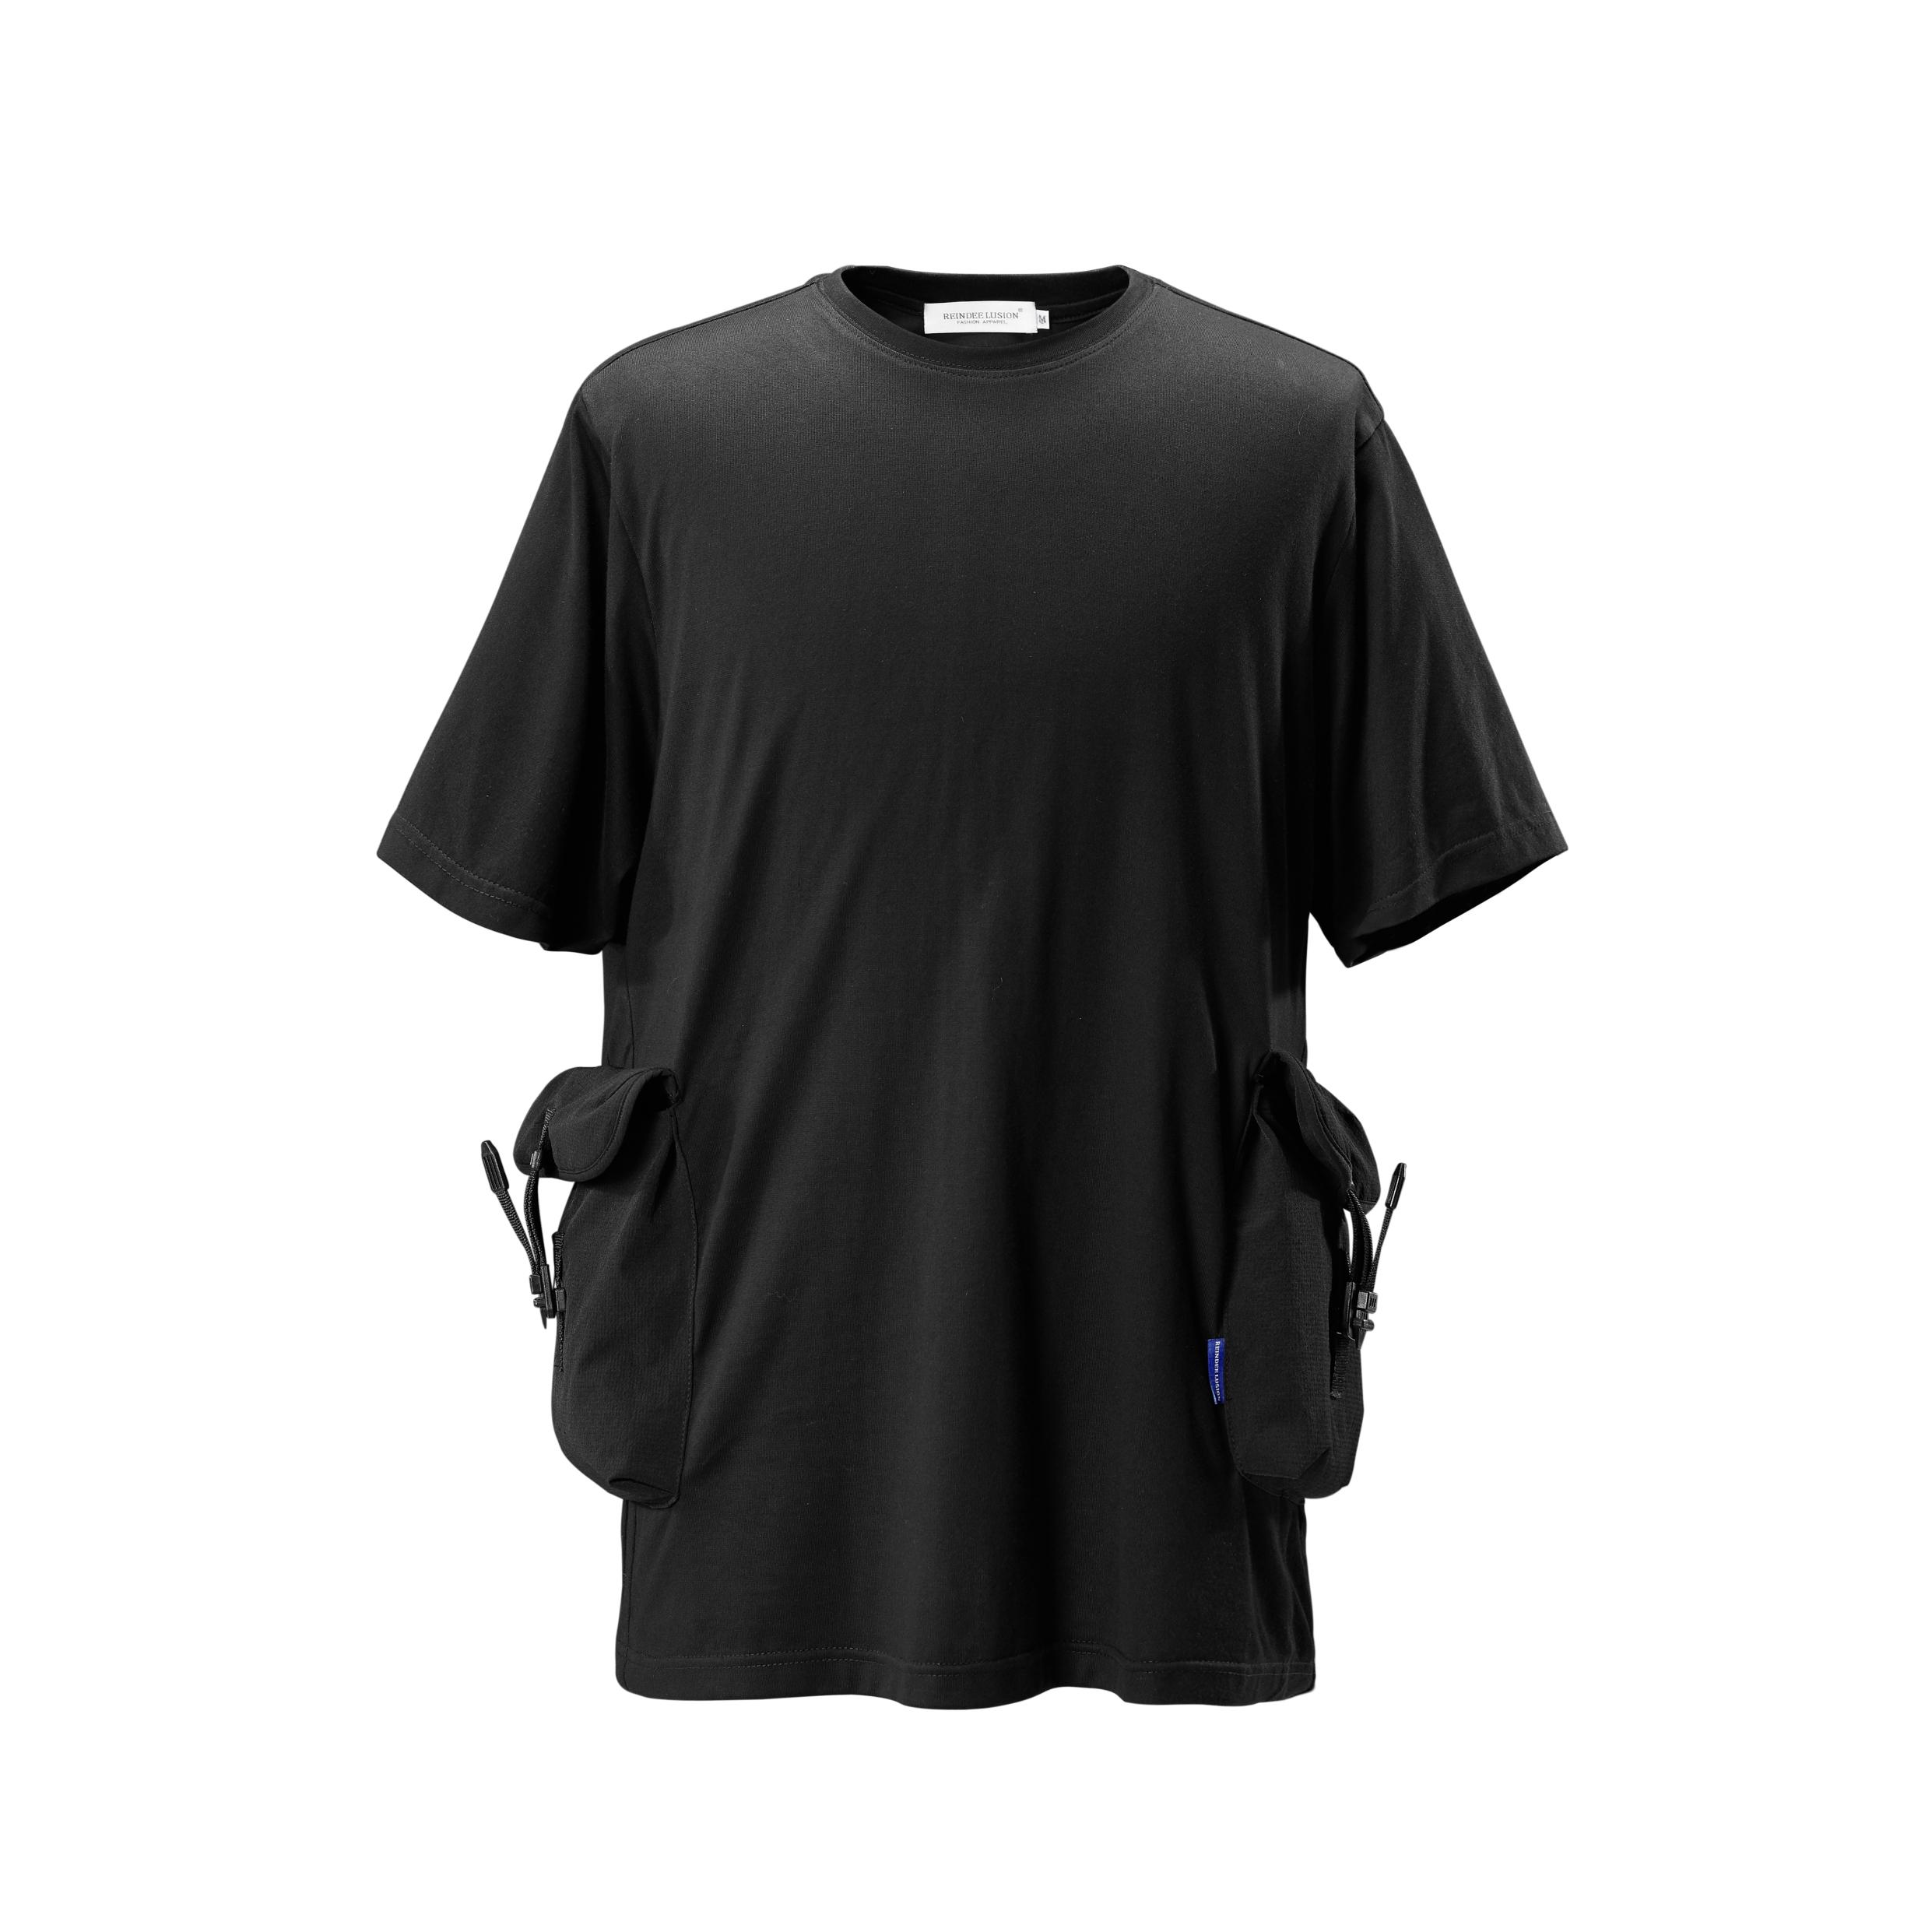 RL | REINDEE LUSION 立体结构快拆扣机能口袋短袖T恤